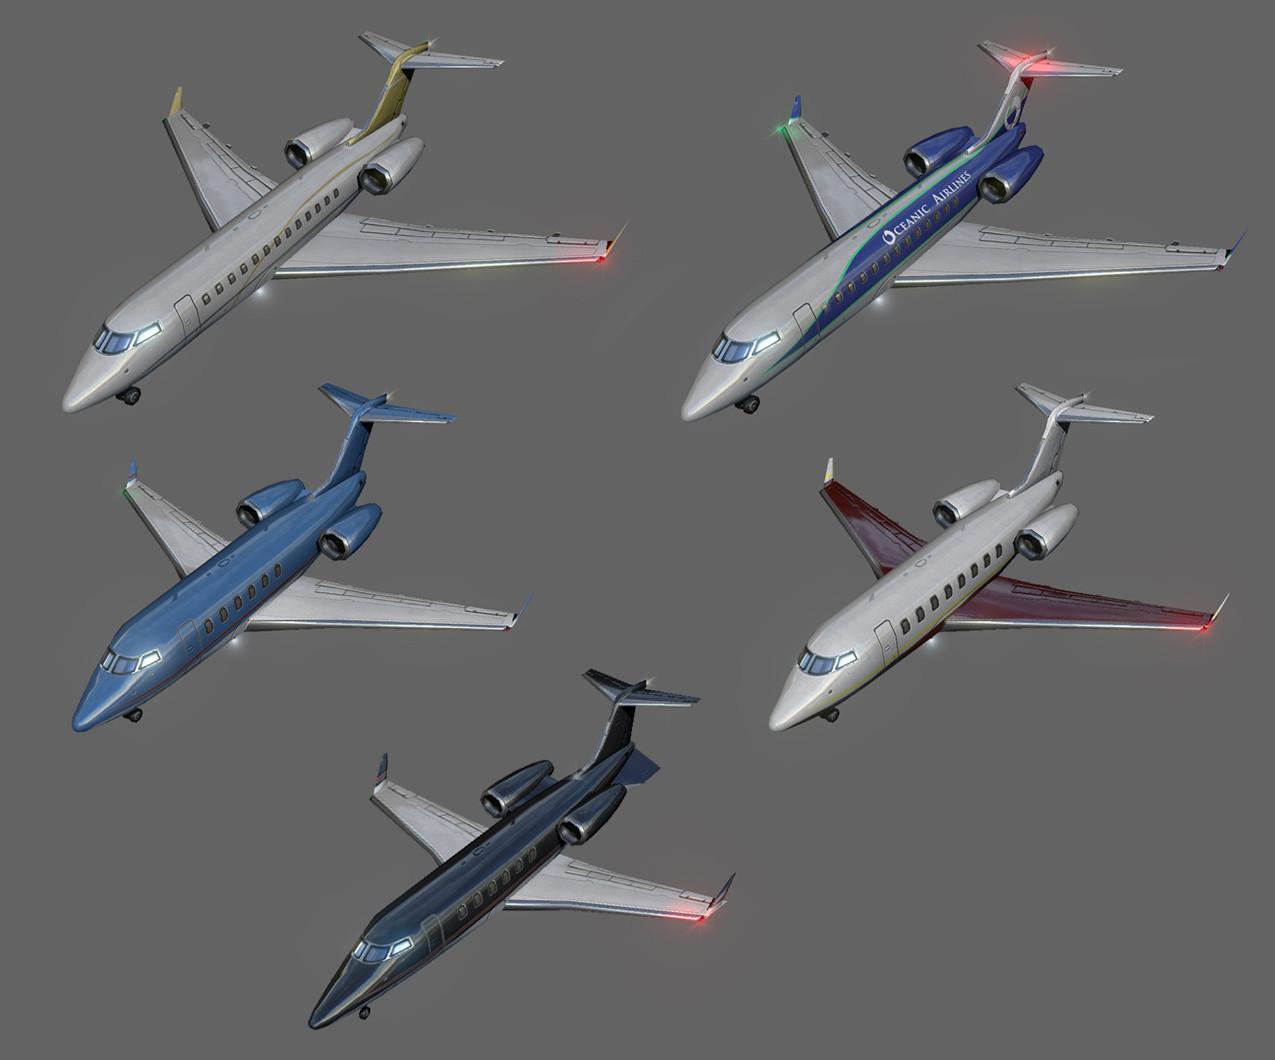 David sanhueza davidsanhueza eon vehicle airplanes 02